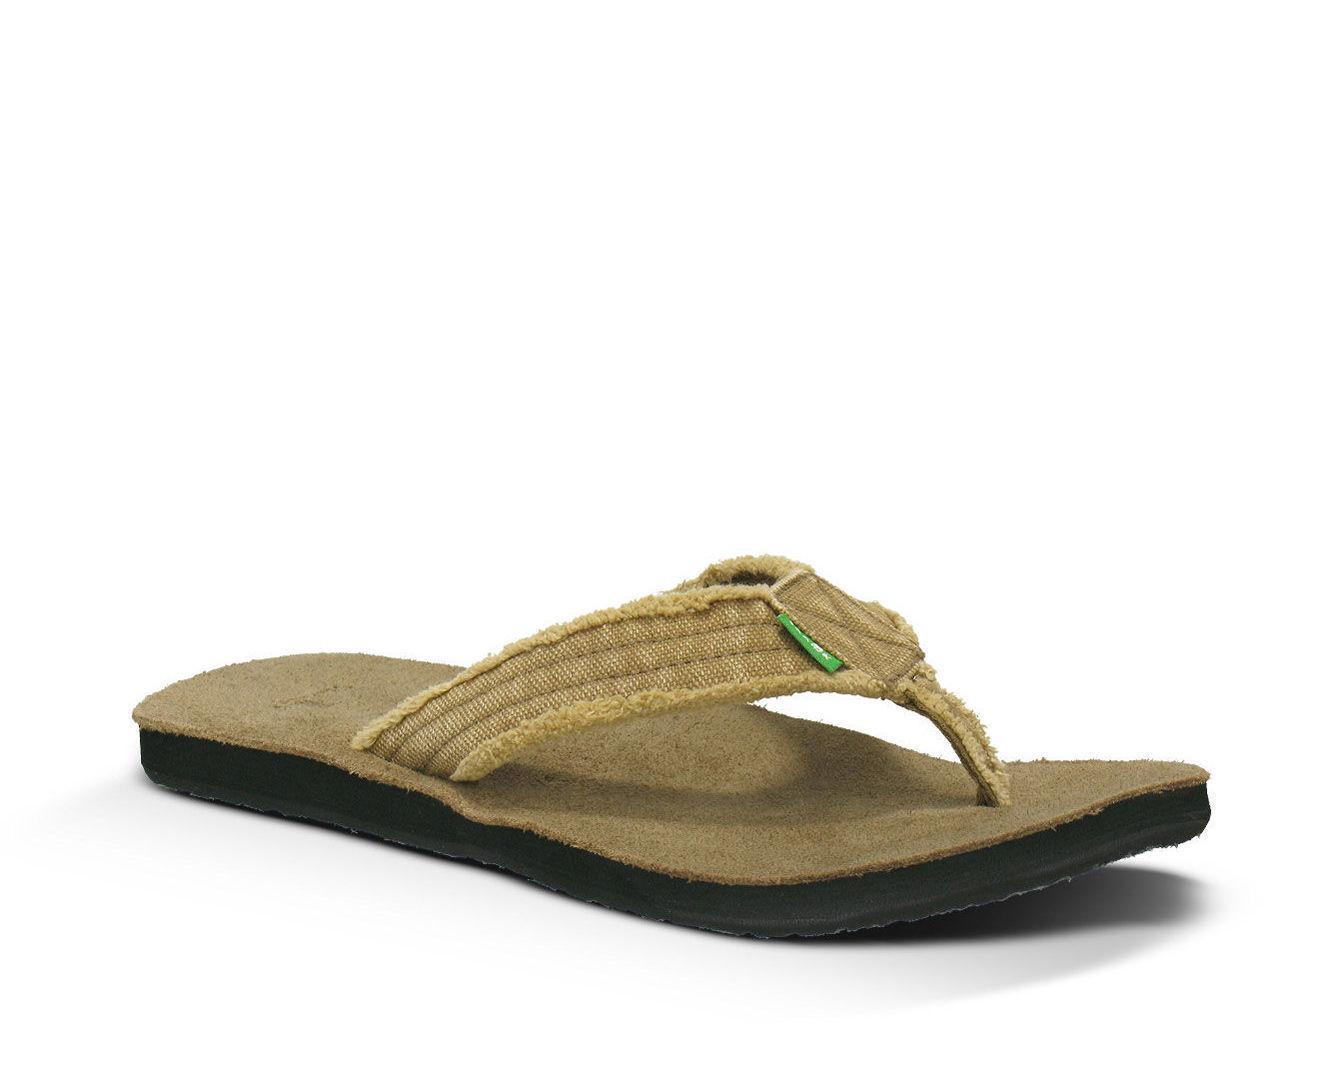 Sanuk Fraid Not Men's Flip Flop Sandals - Khaki - SMS2117